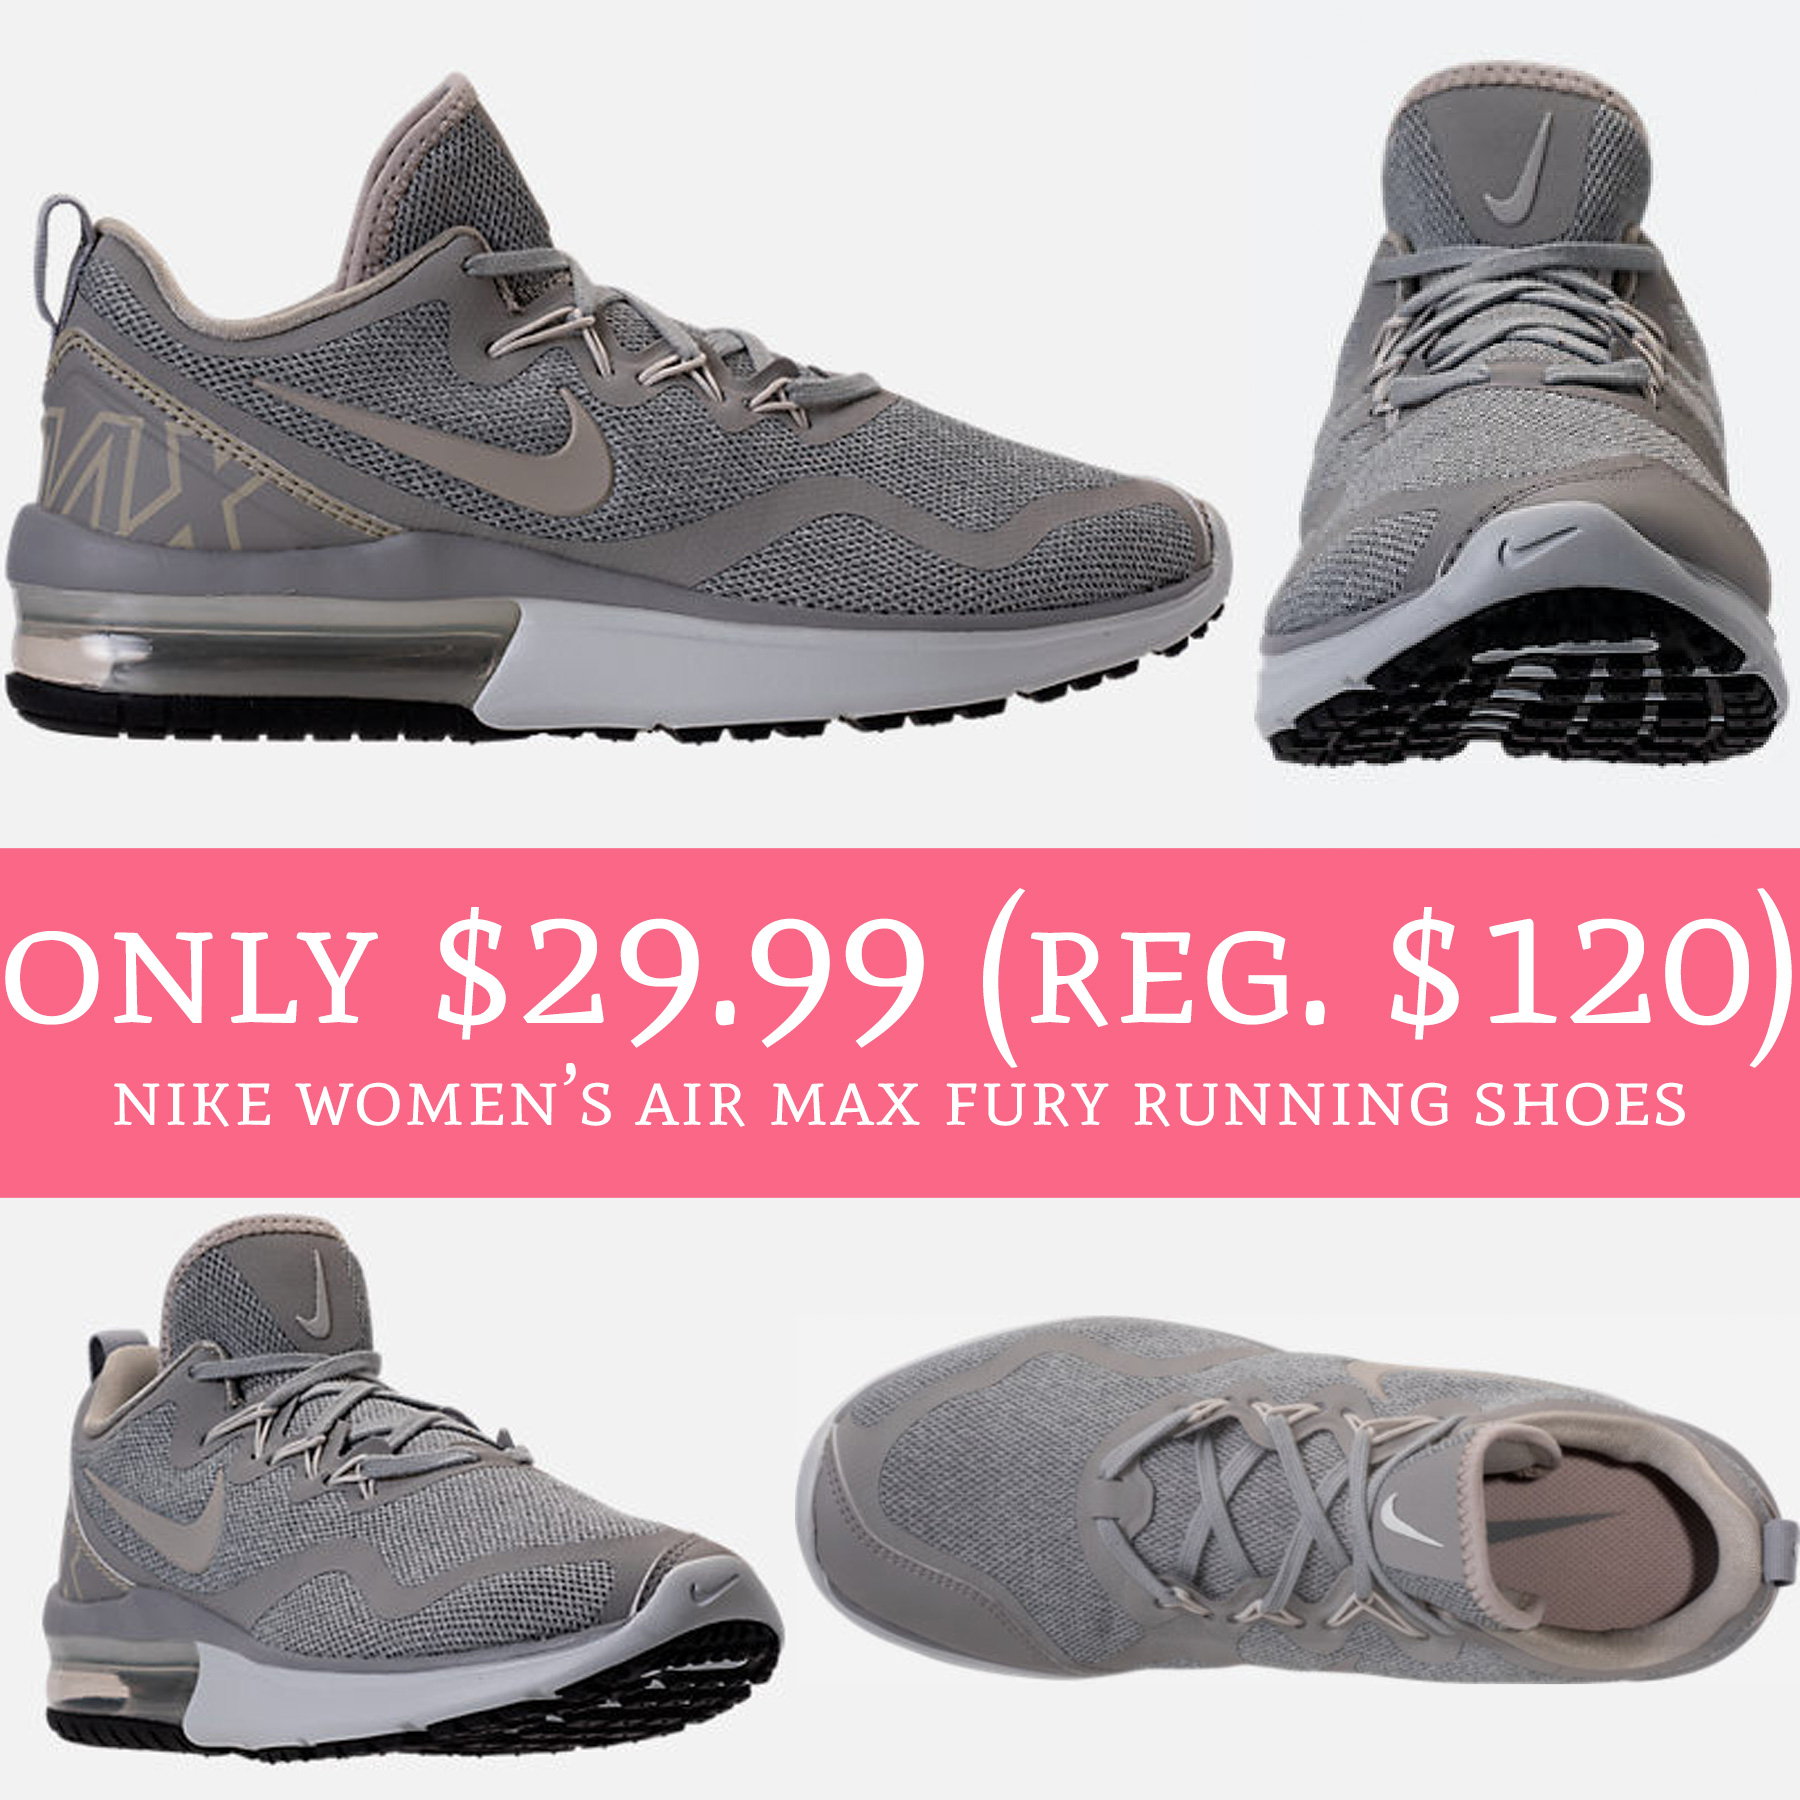 buy online 0c1e2 edf31 Only $29.99 (Regular $120) Nike Women's Air Max Fury Running ...